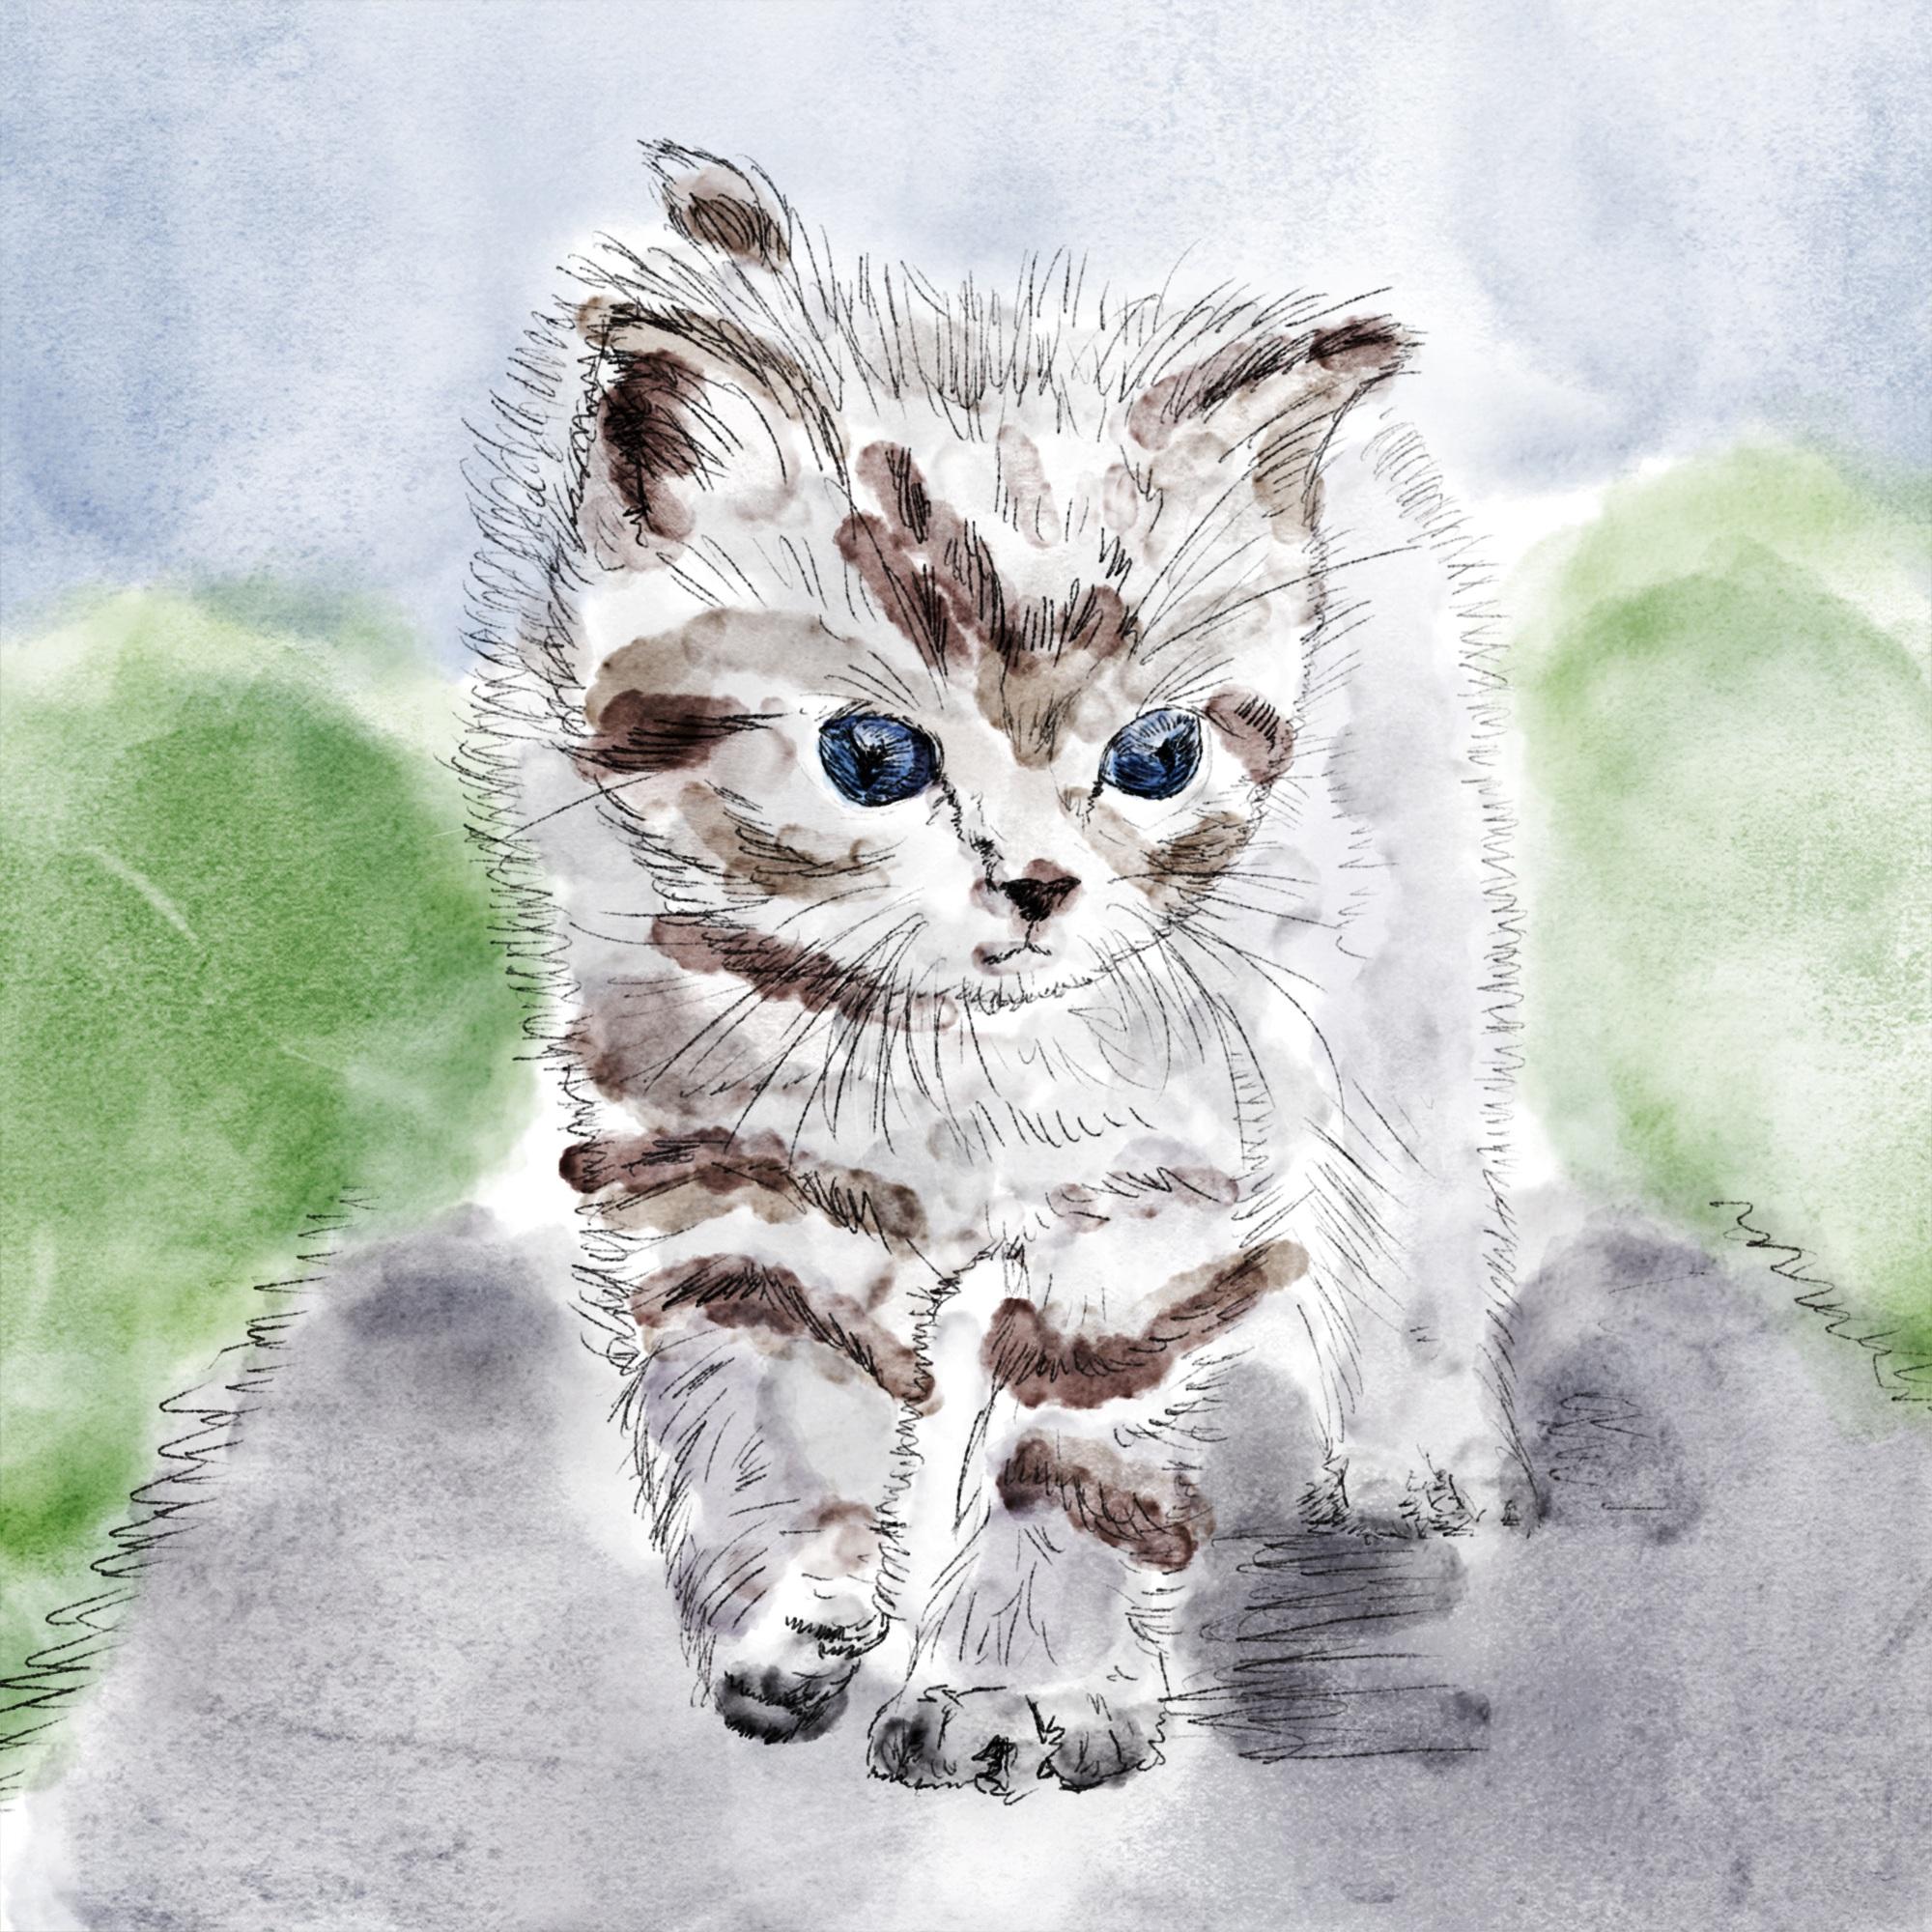 Gambar Anak Kucing Binatang Menyusui Cat Air Cambang